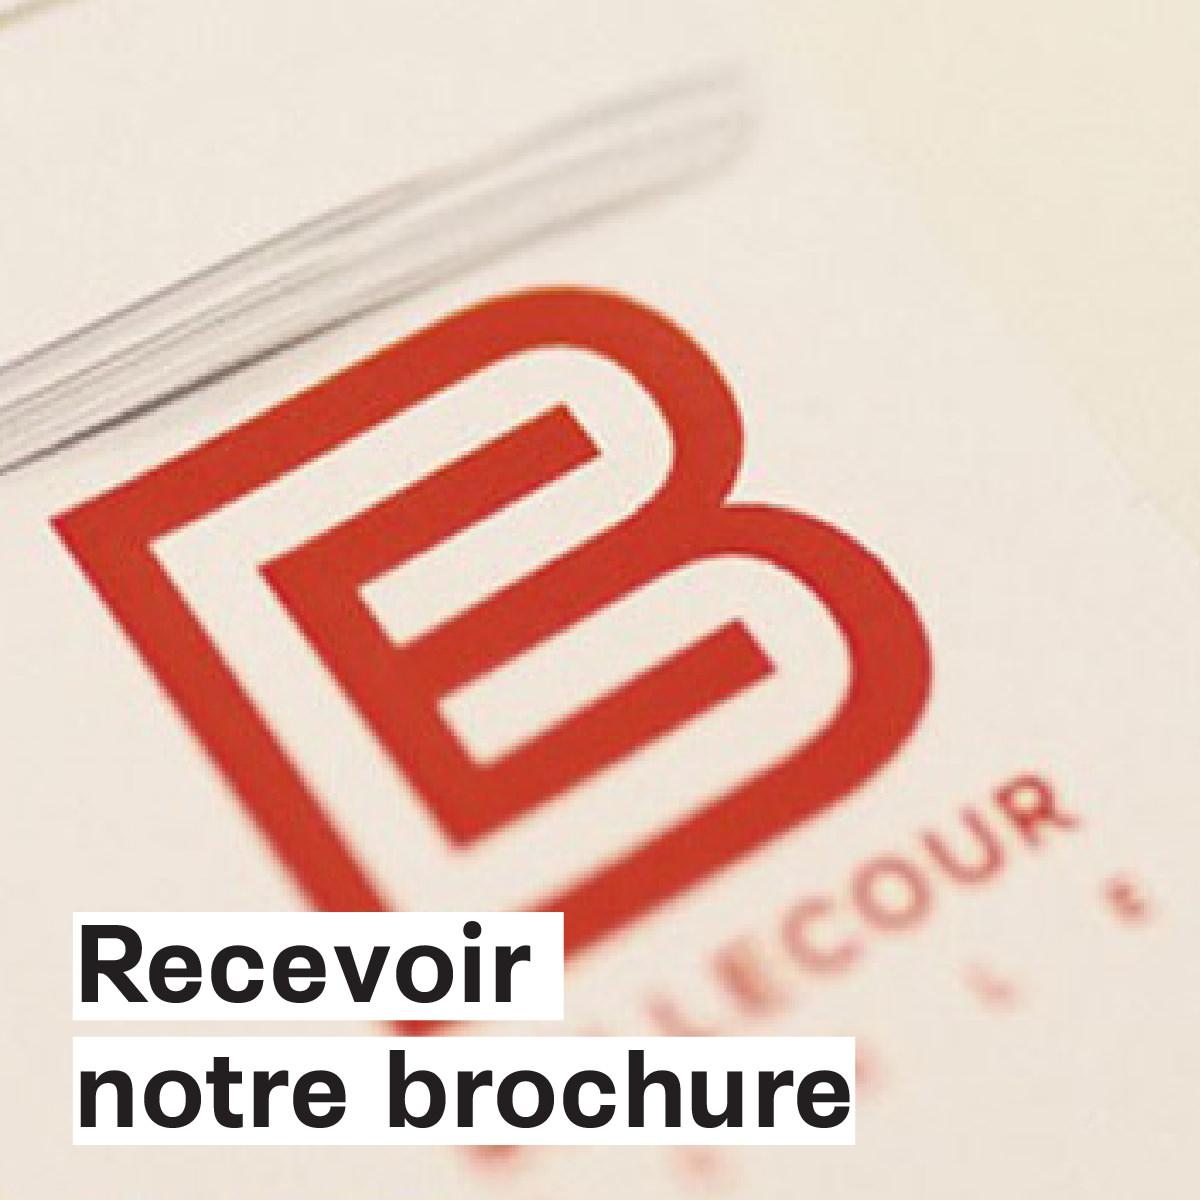 Bellecour Ecole - Brochure